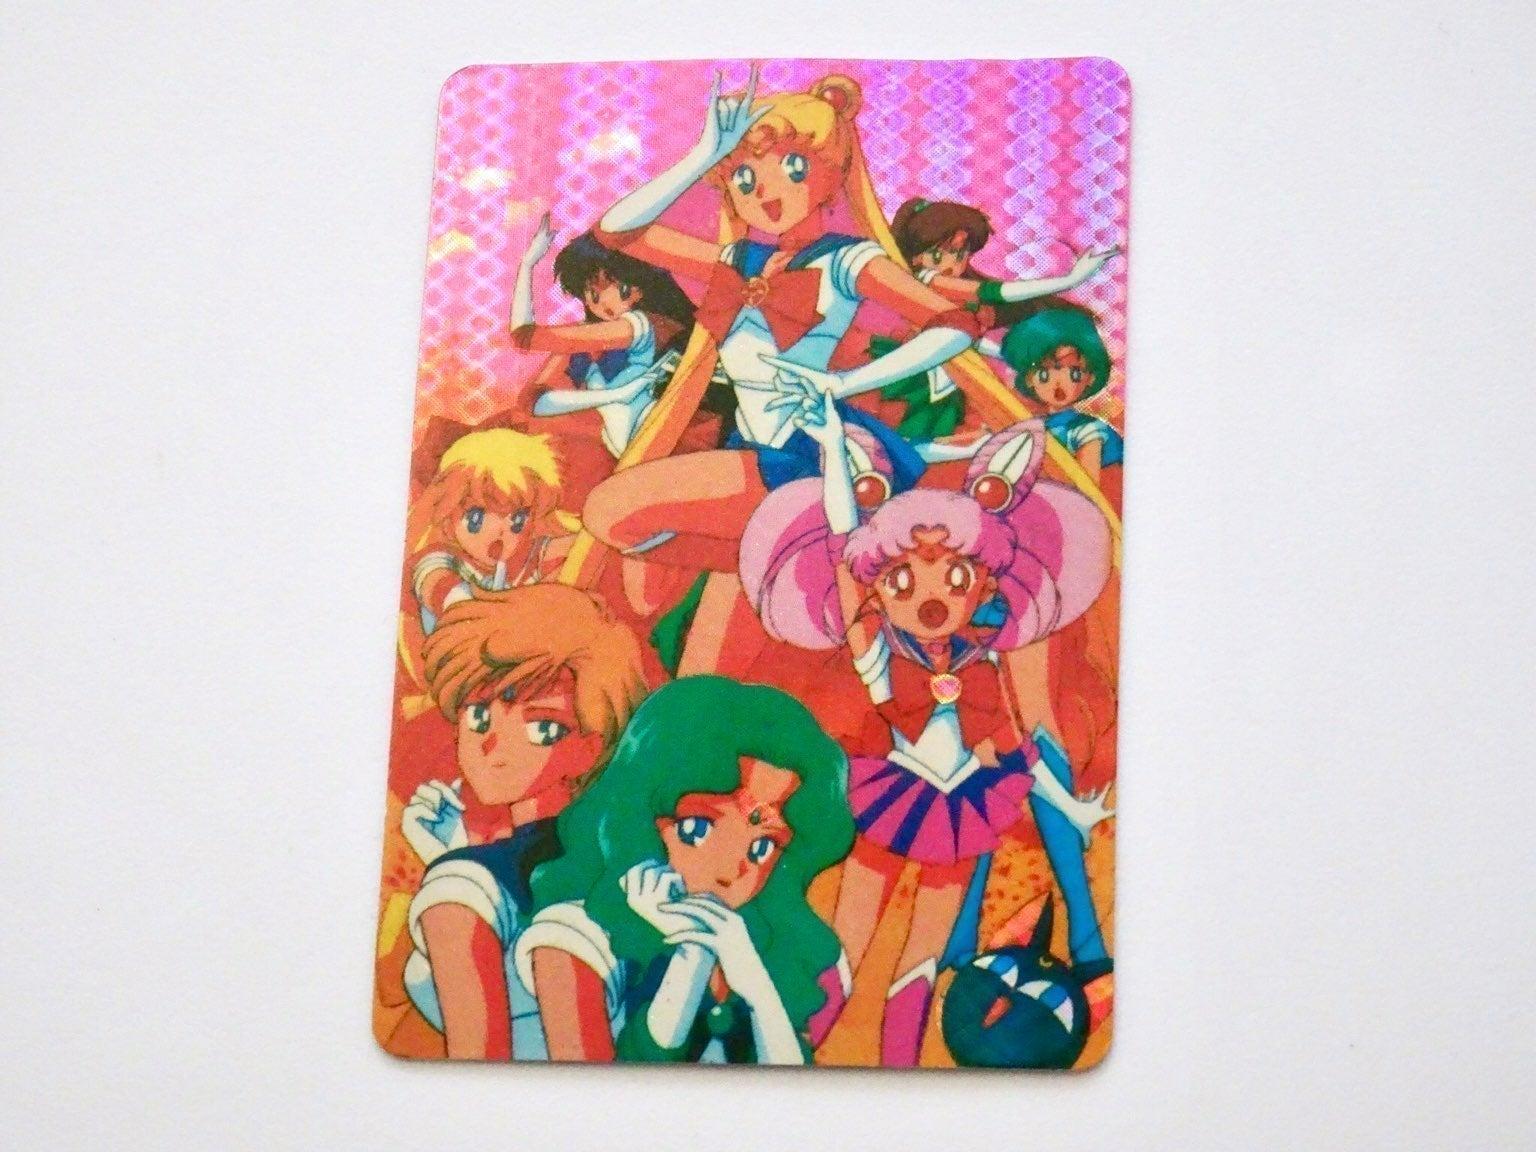 Vintage Sailor Moon Prism Holo Sticker